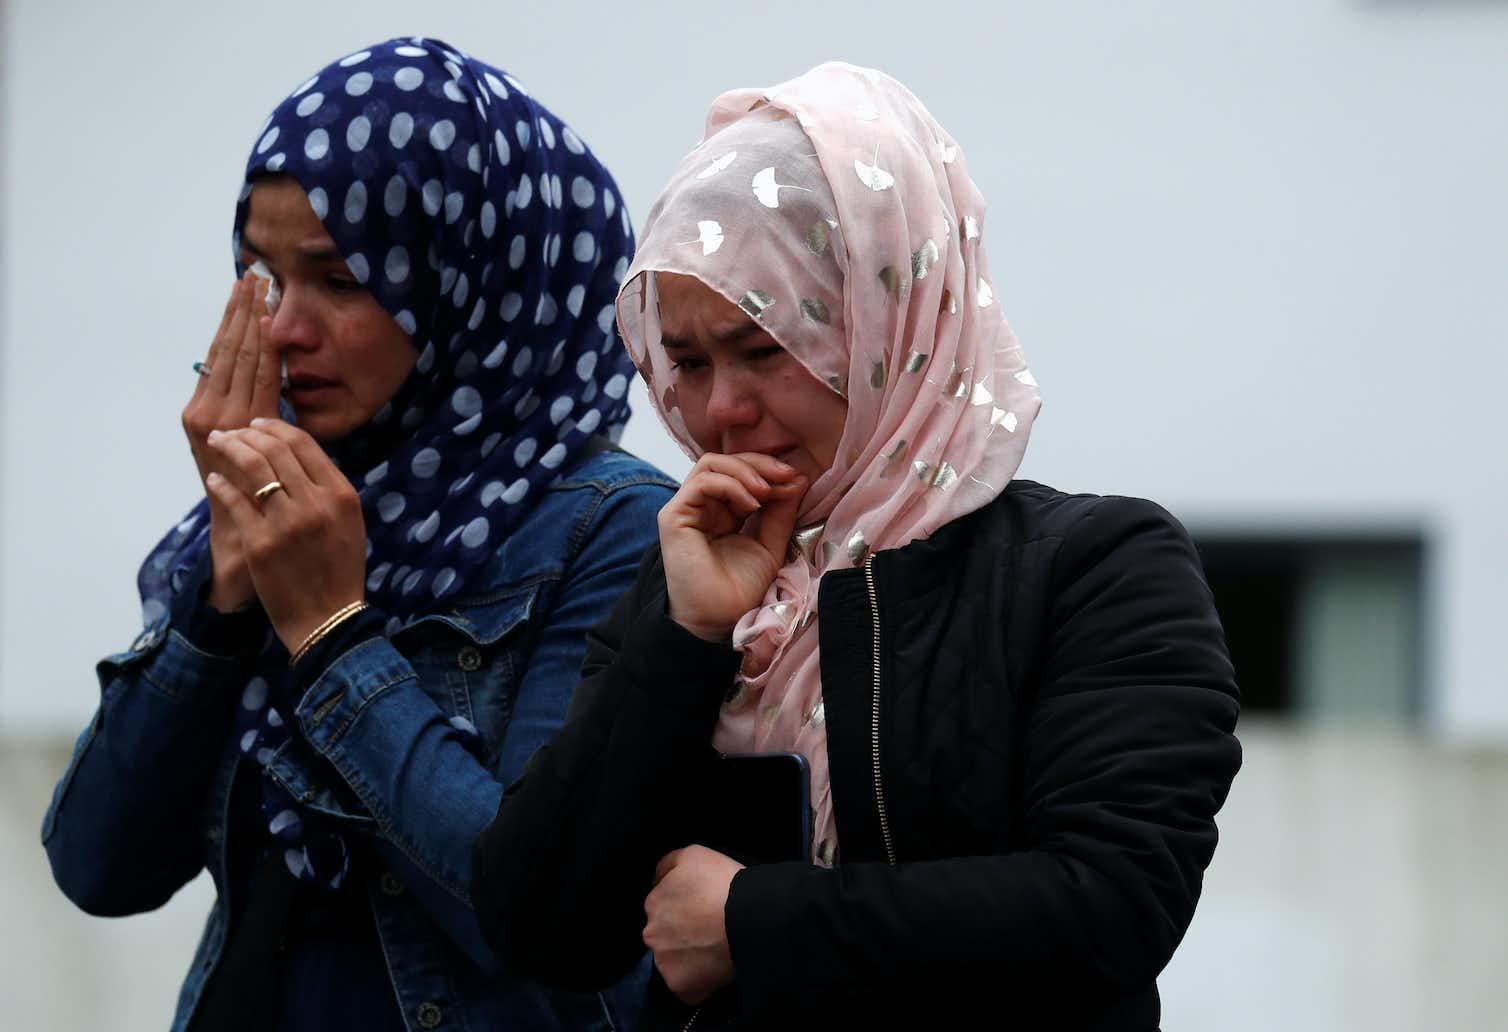 People grieve outside New Zealand's Masjid Al Noor on March 18, 2019. Photo credit: Reuters/Jorge Silva